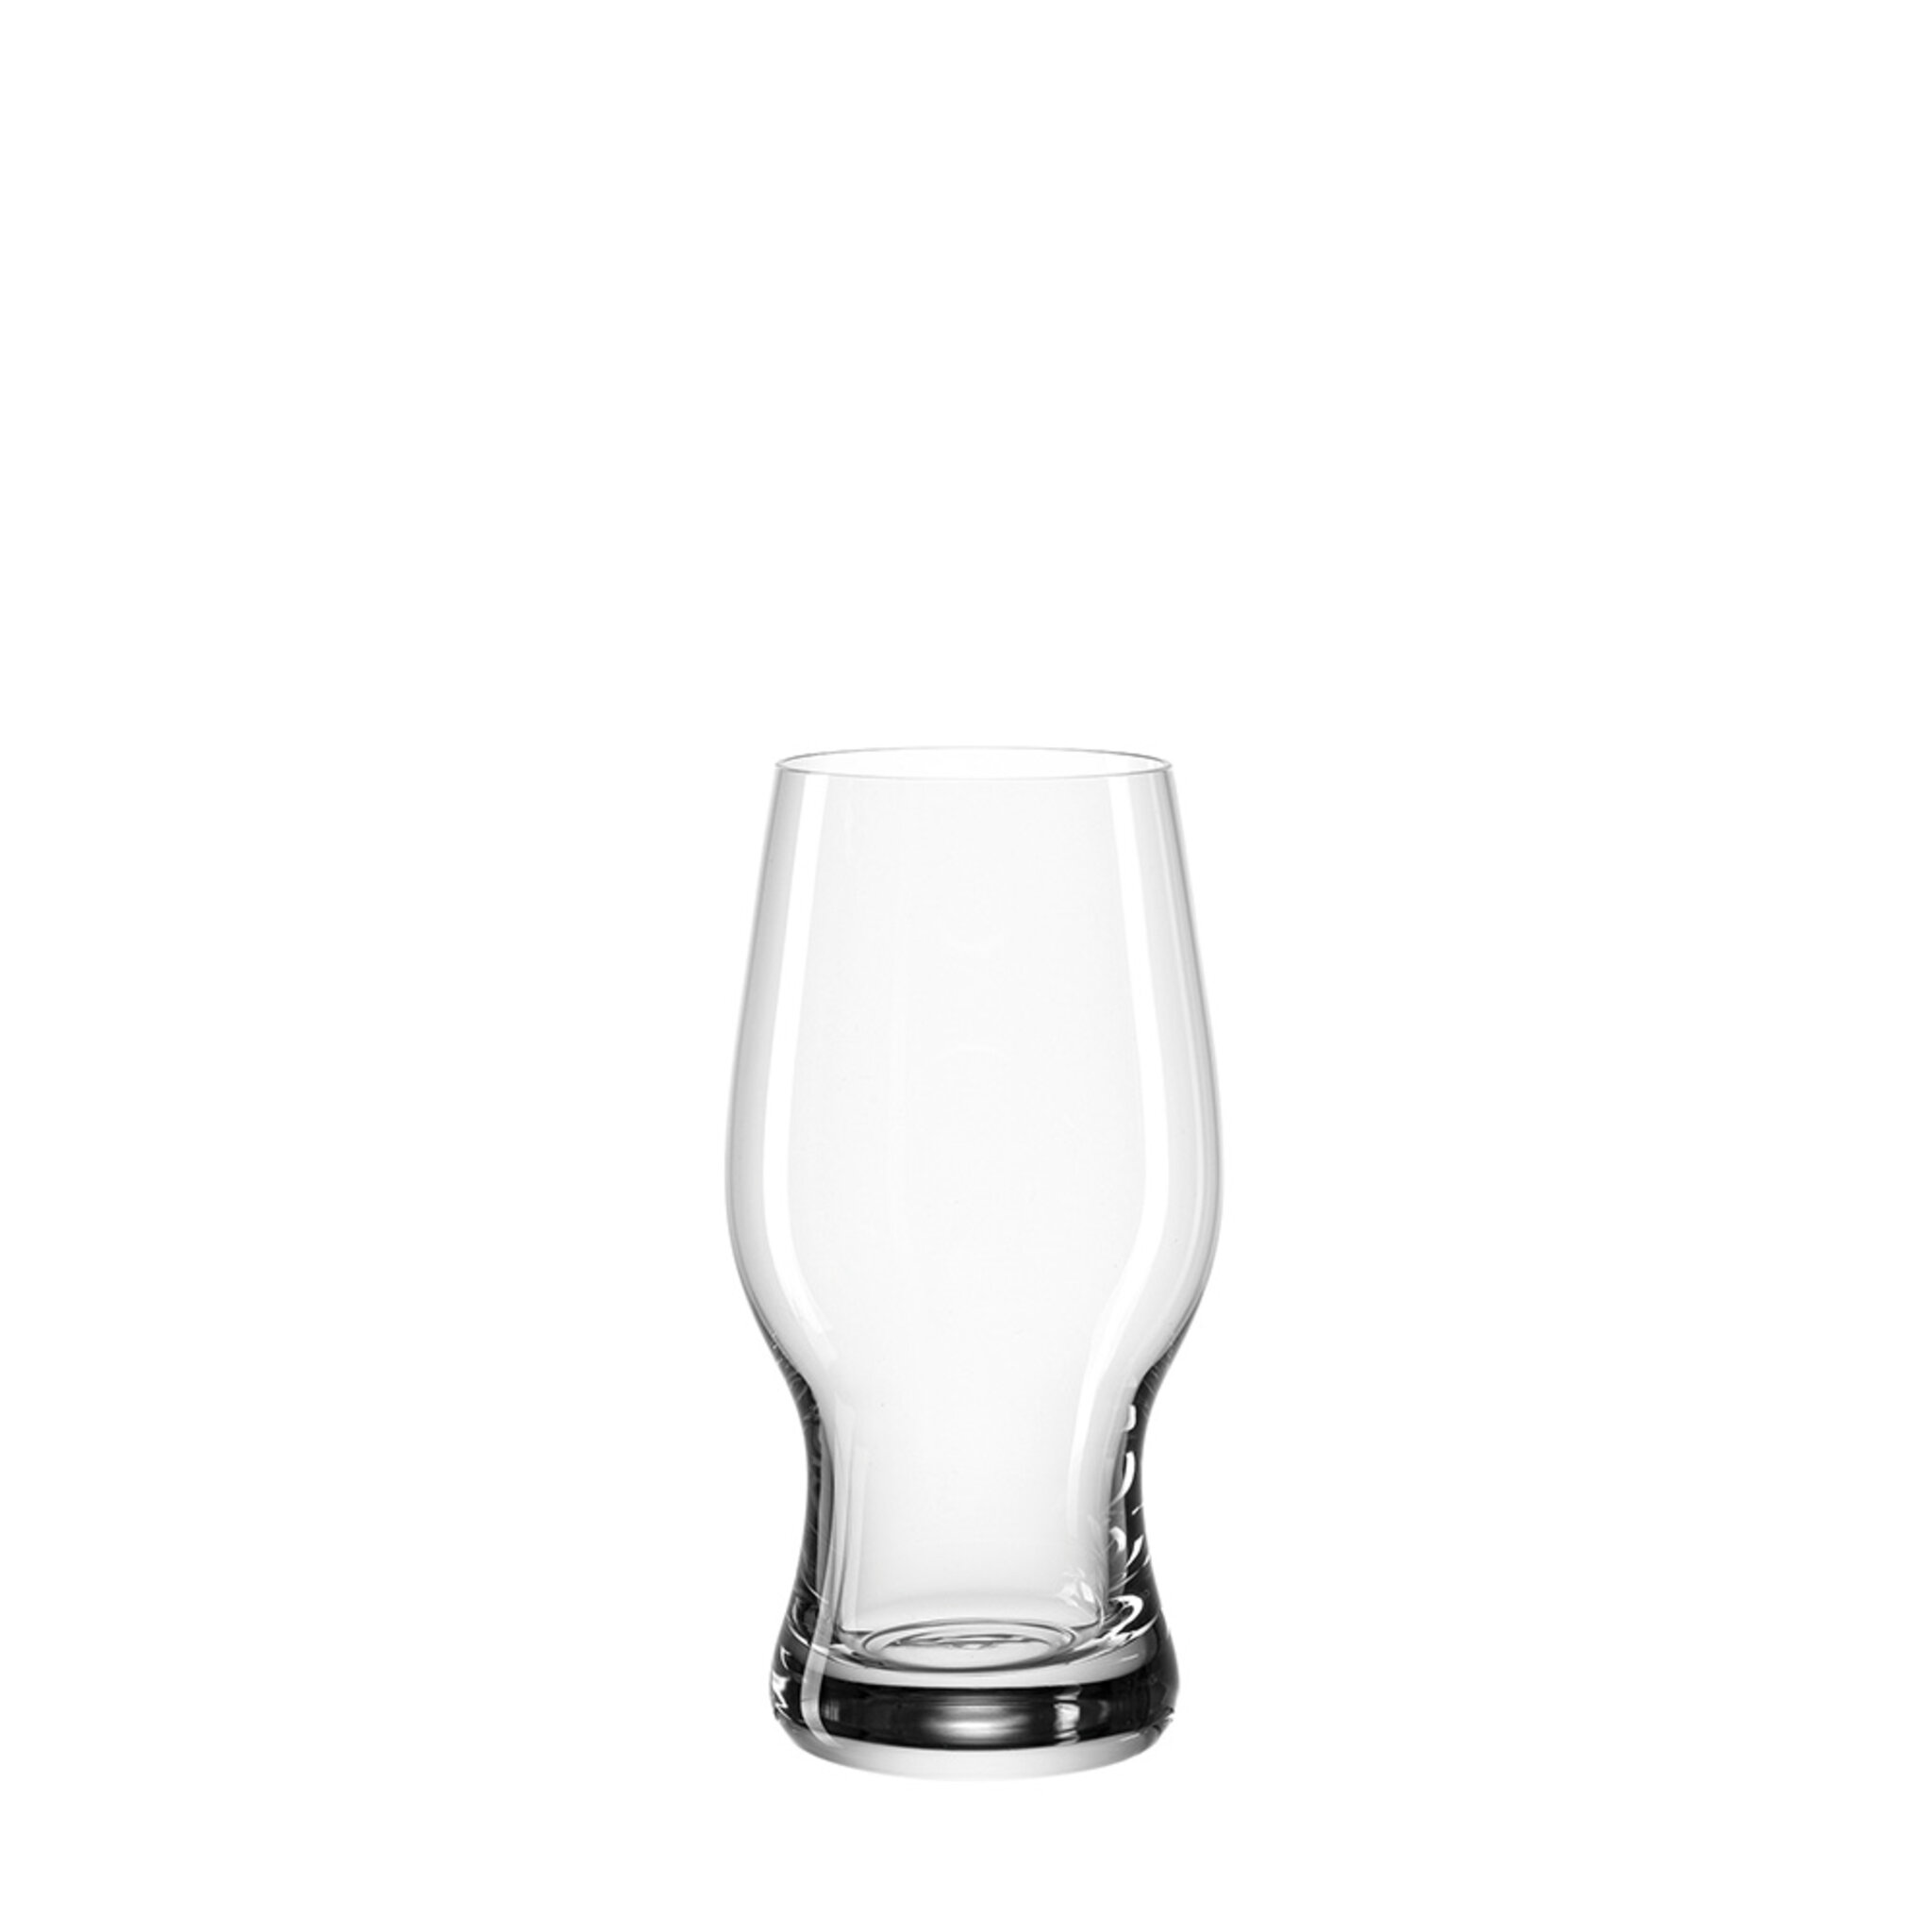 Taverna Ölglas IPA-glas 0,5l Set/2